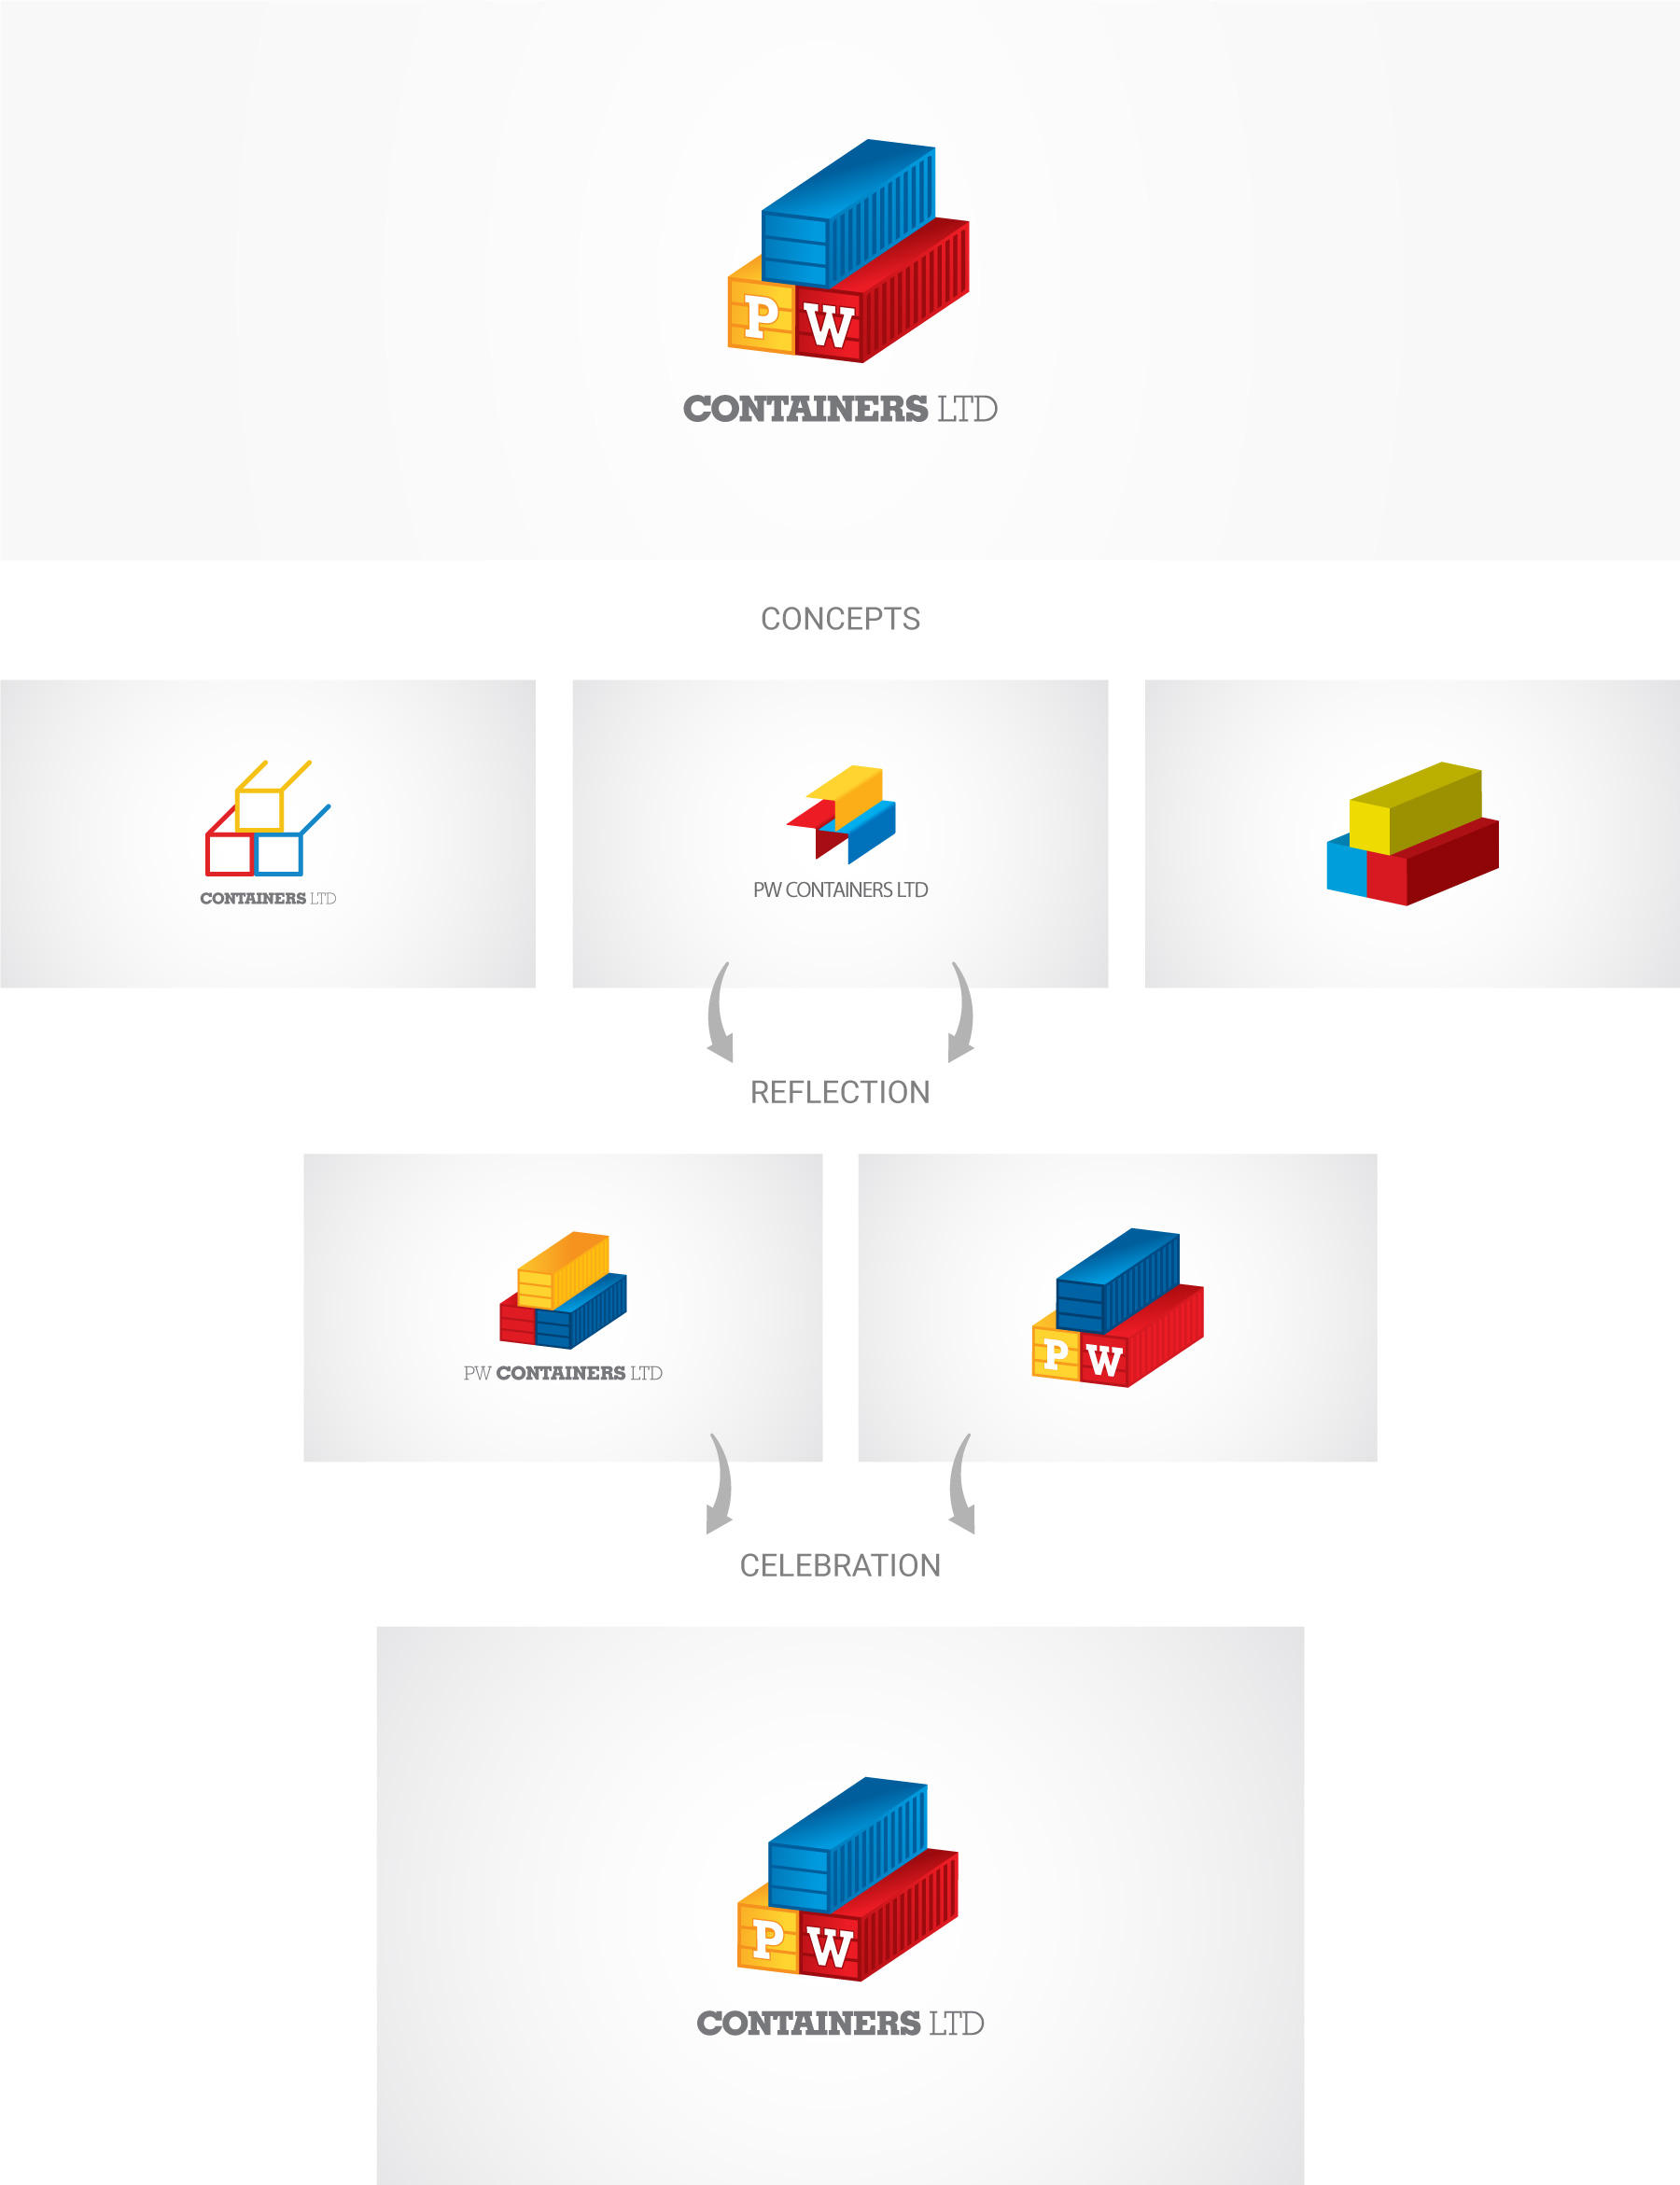 Pw-containers-ltd-logo-design